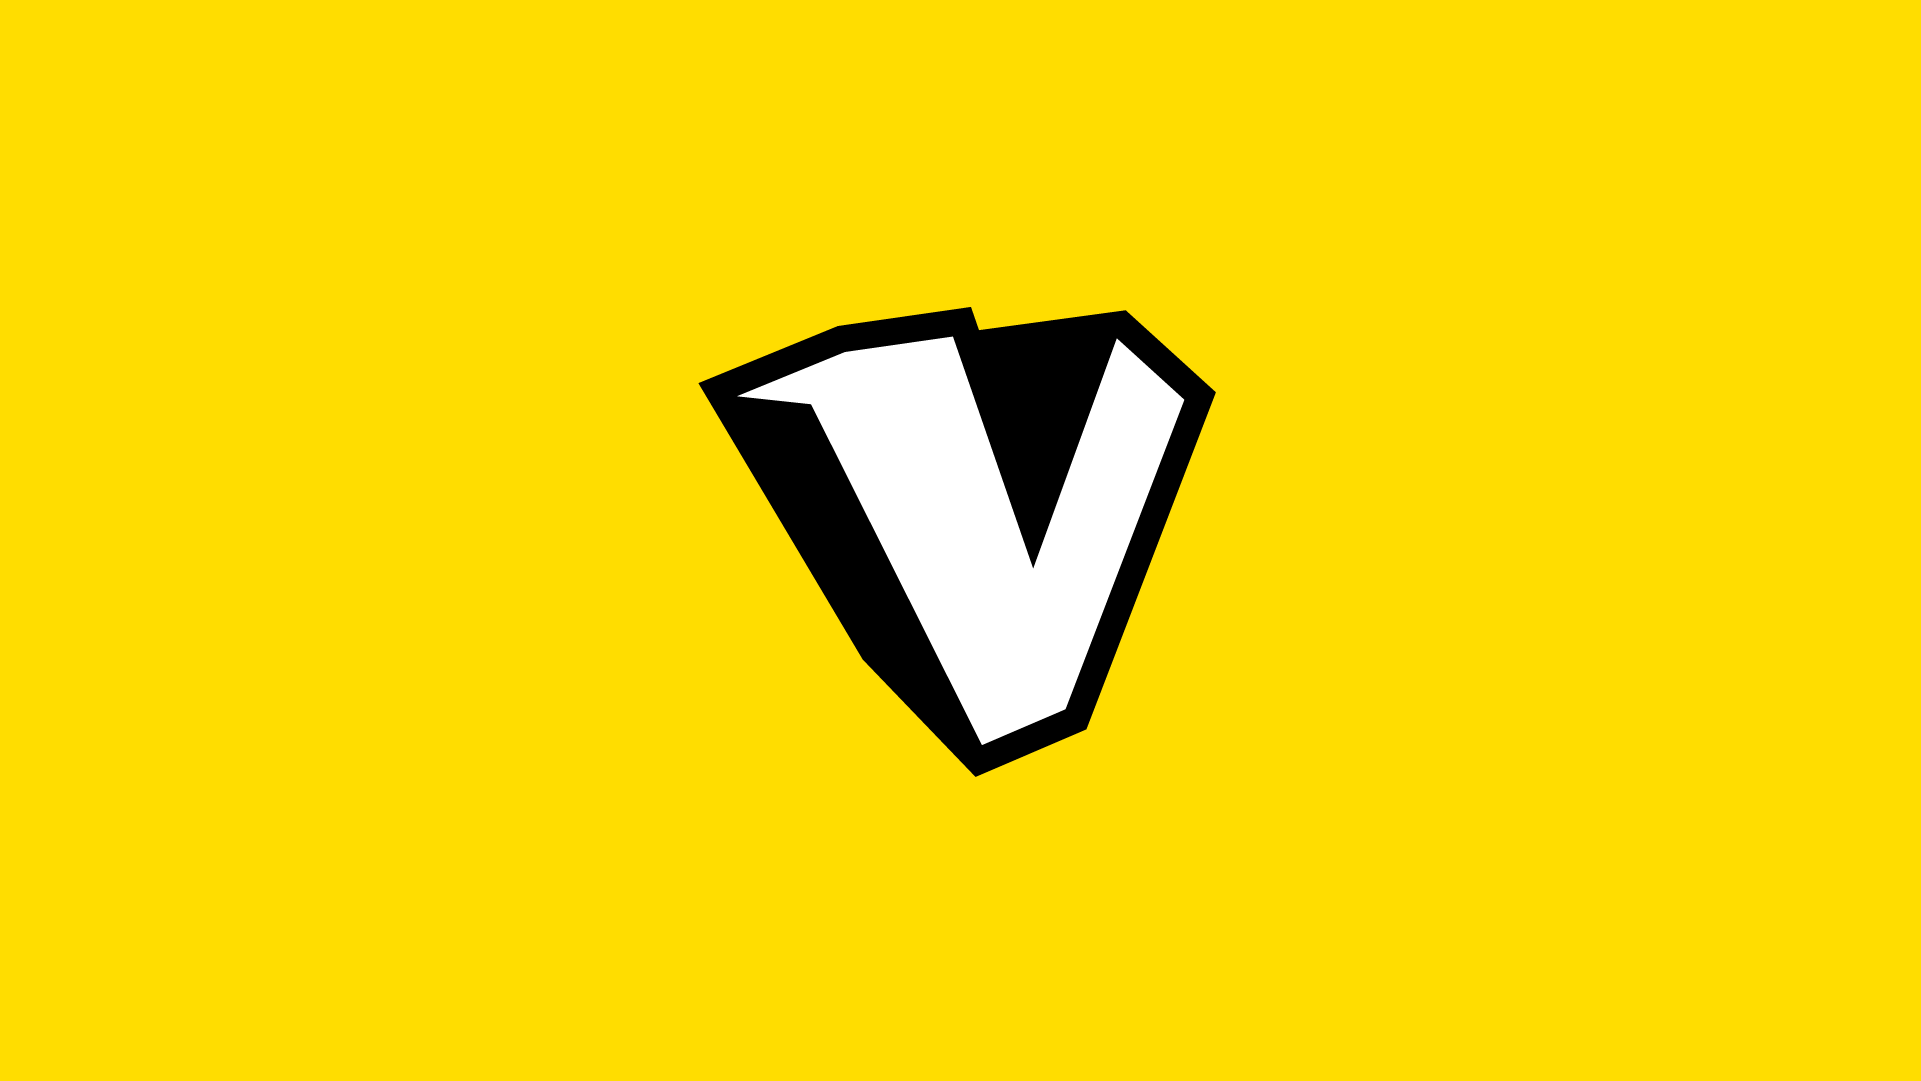 vrv_logos-02.png